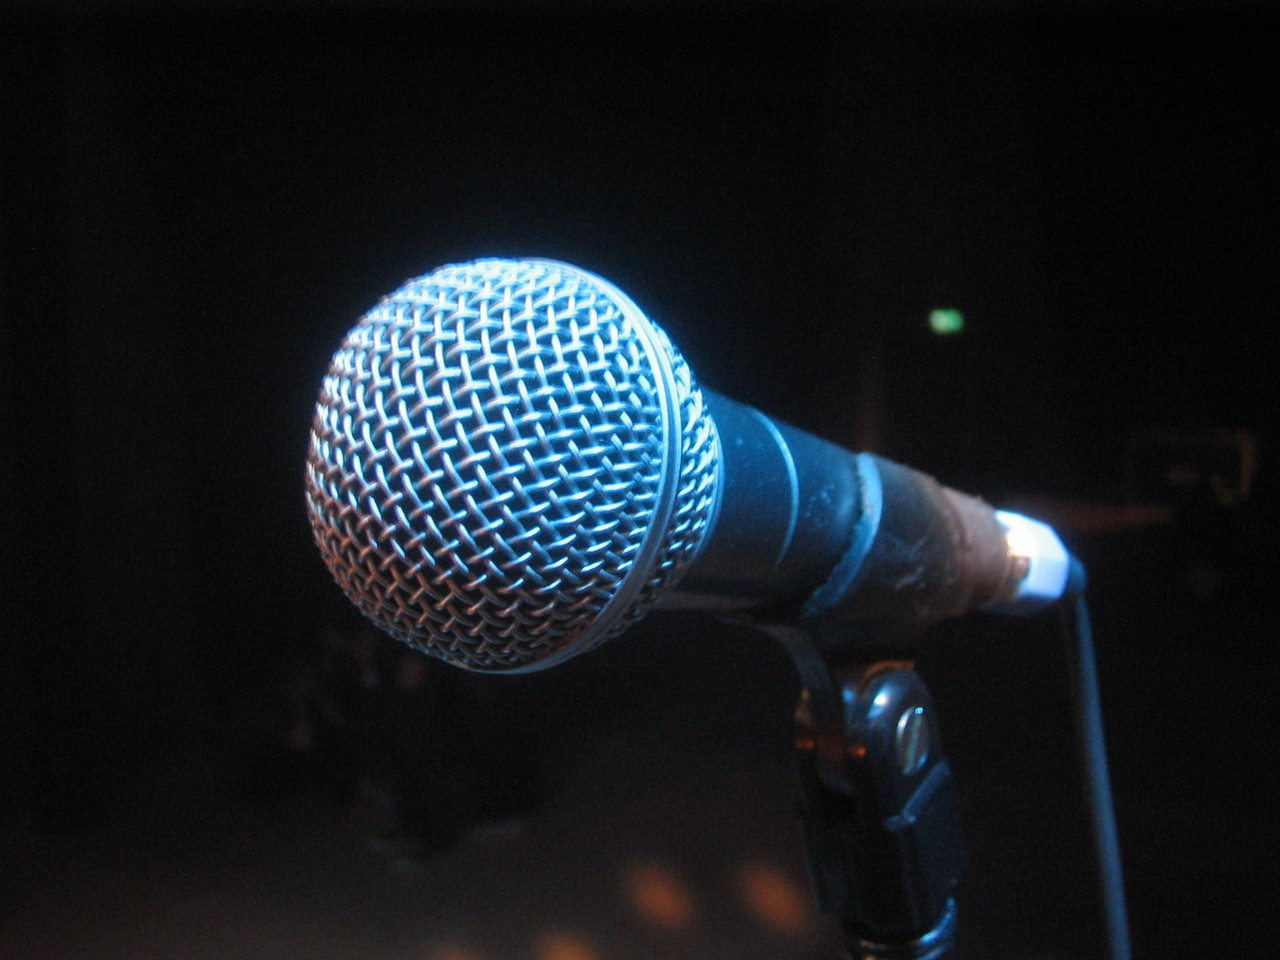 Mikrofon do śpiewania karaoke